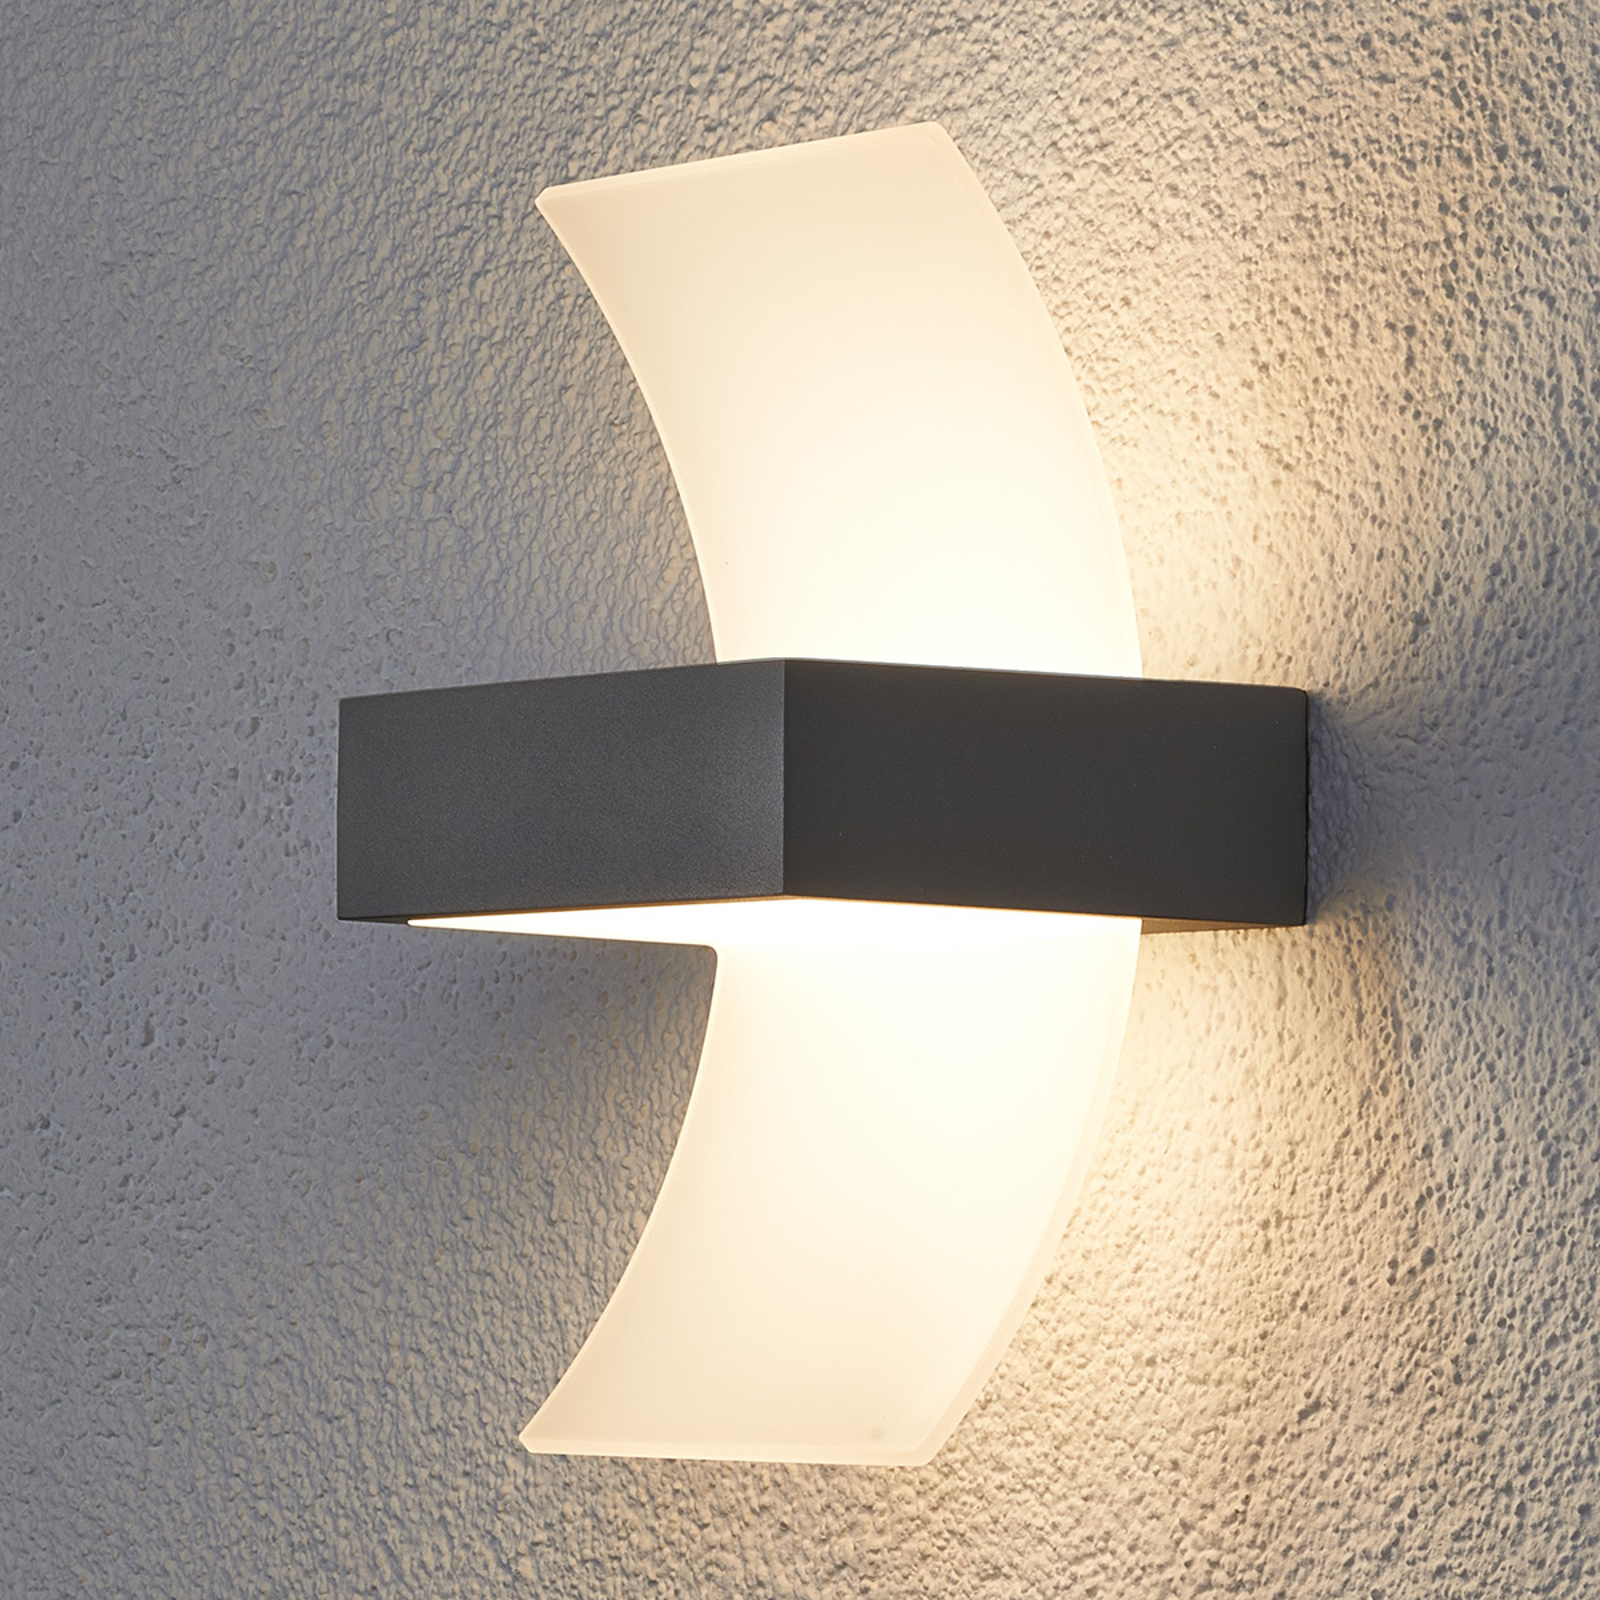 Skadi, Curved LED Exterior Wall Lamp_9619021_1